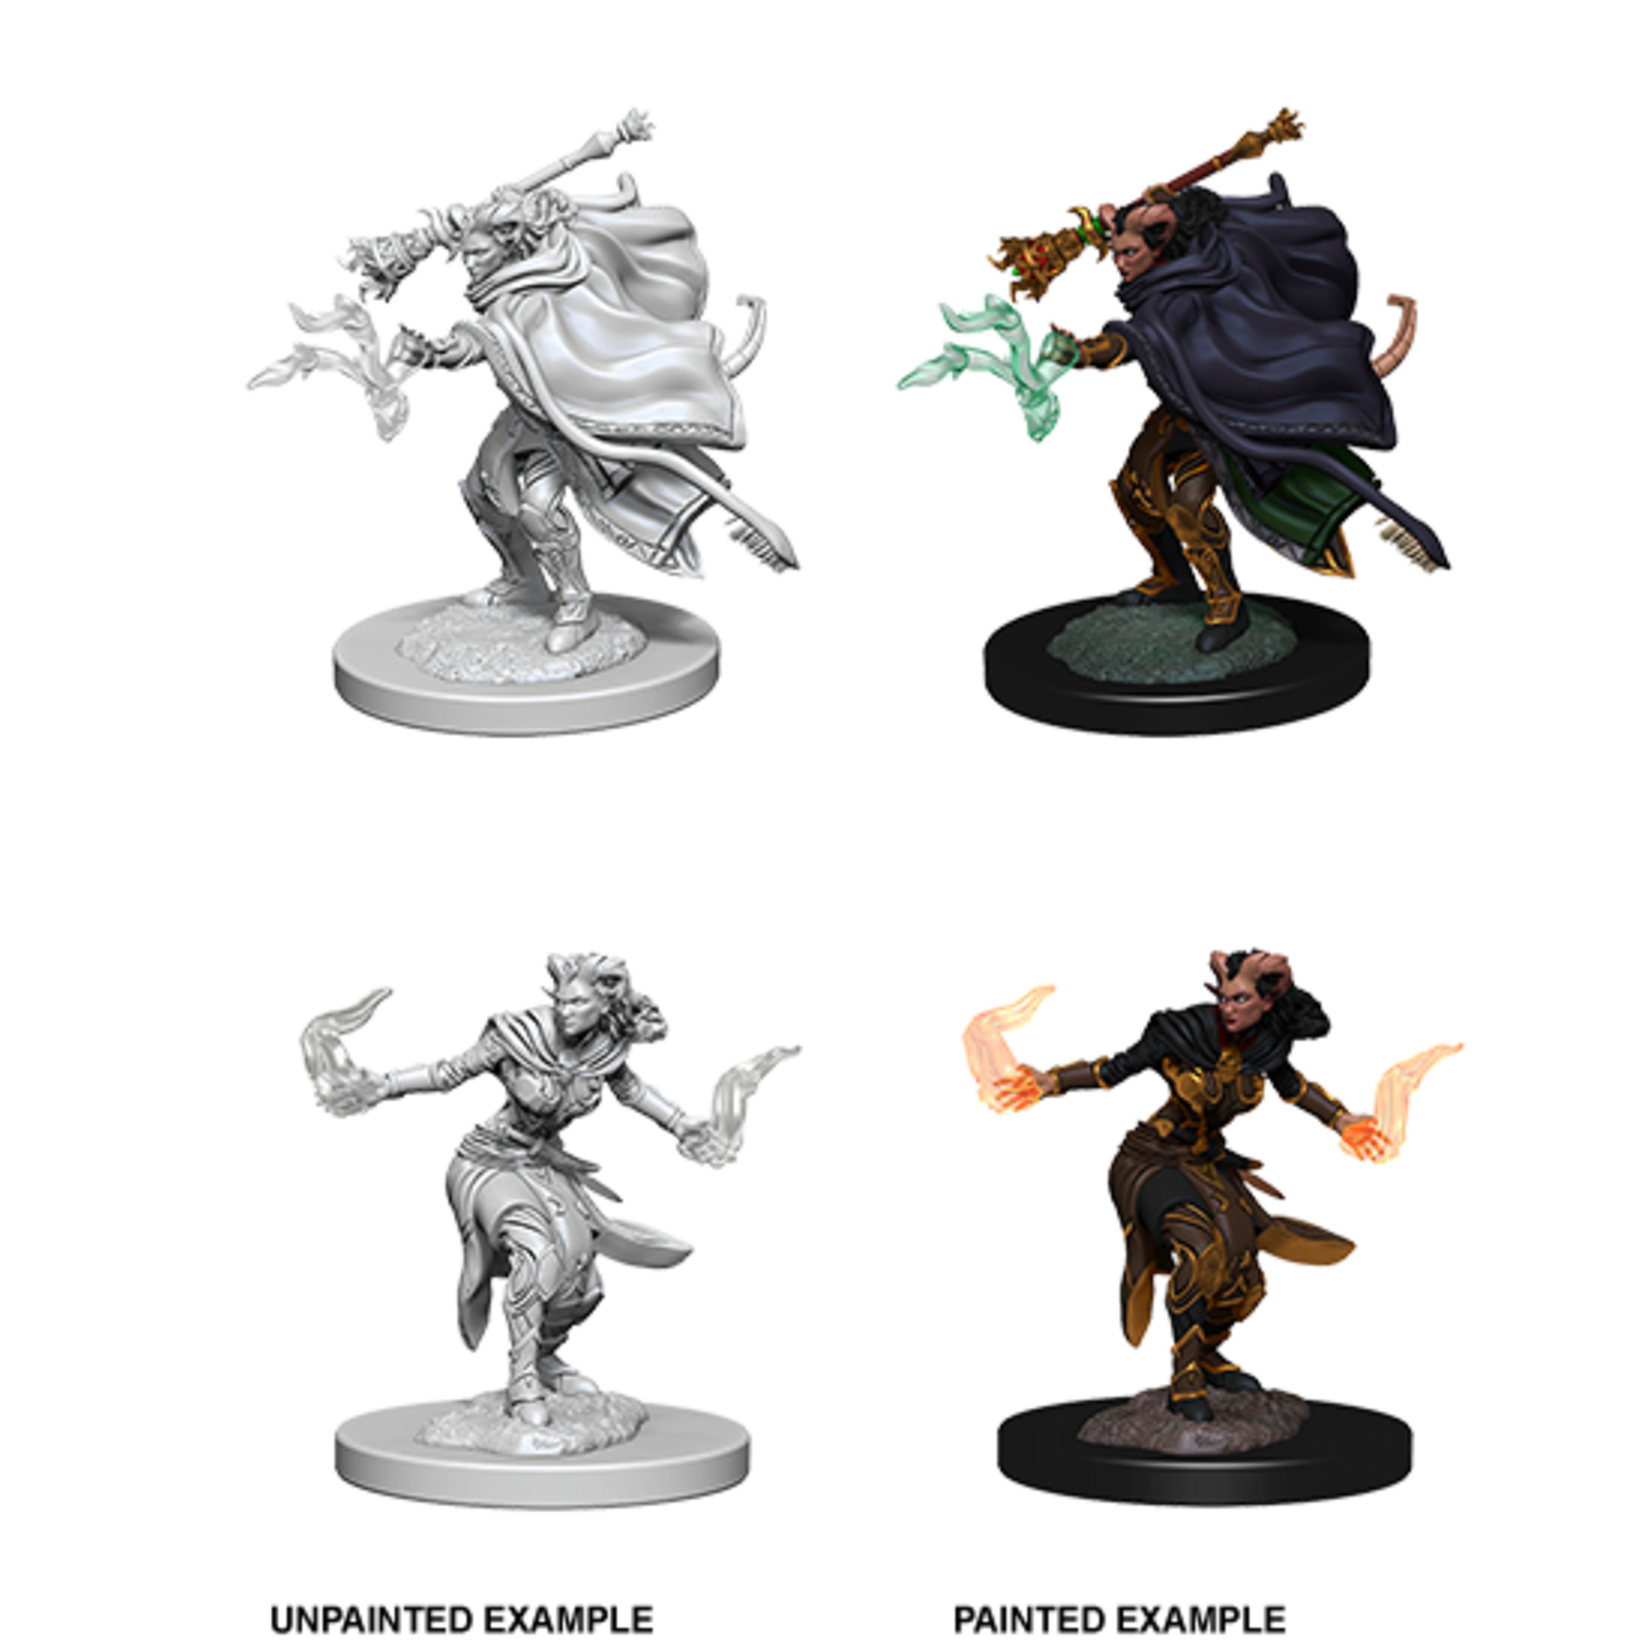 WizKids D&D Nolzur's Marvelous Miniatures: Tiefling Female Warlock (W6)